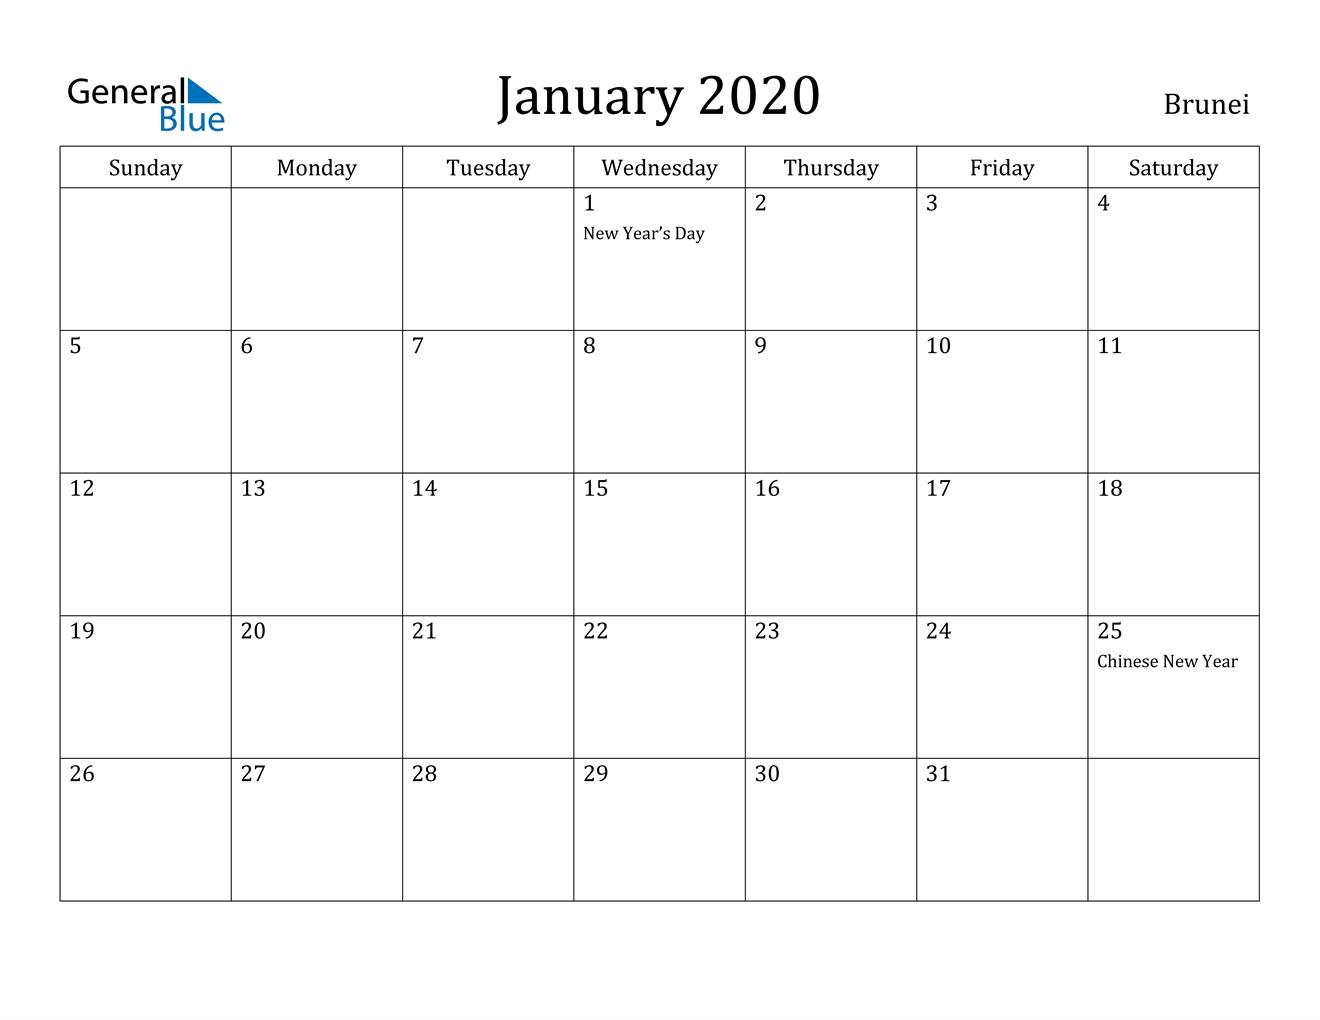 January 2020 Calendar - Brunei